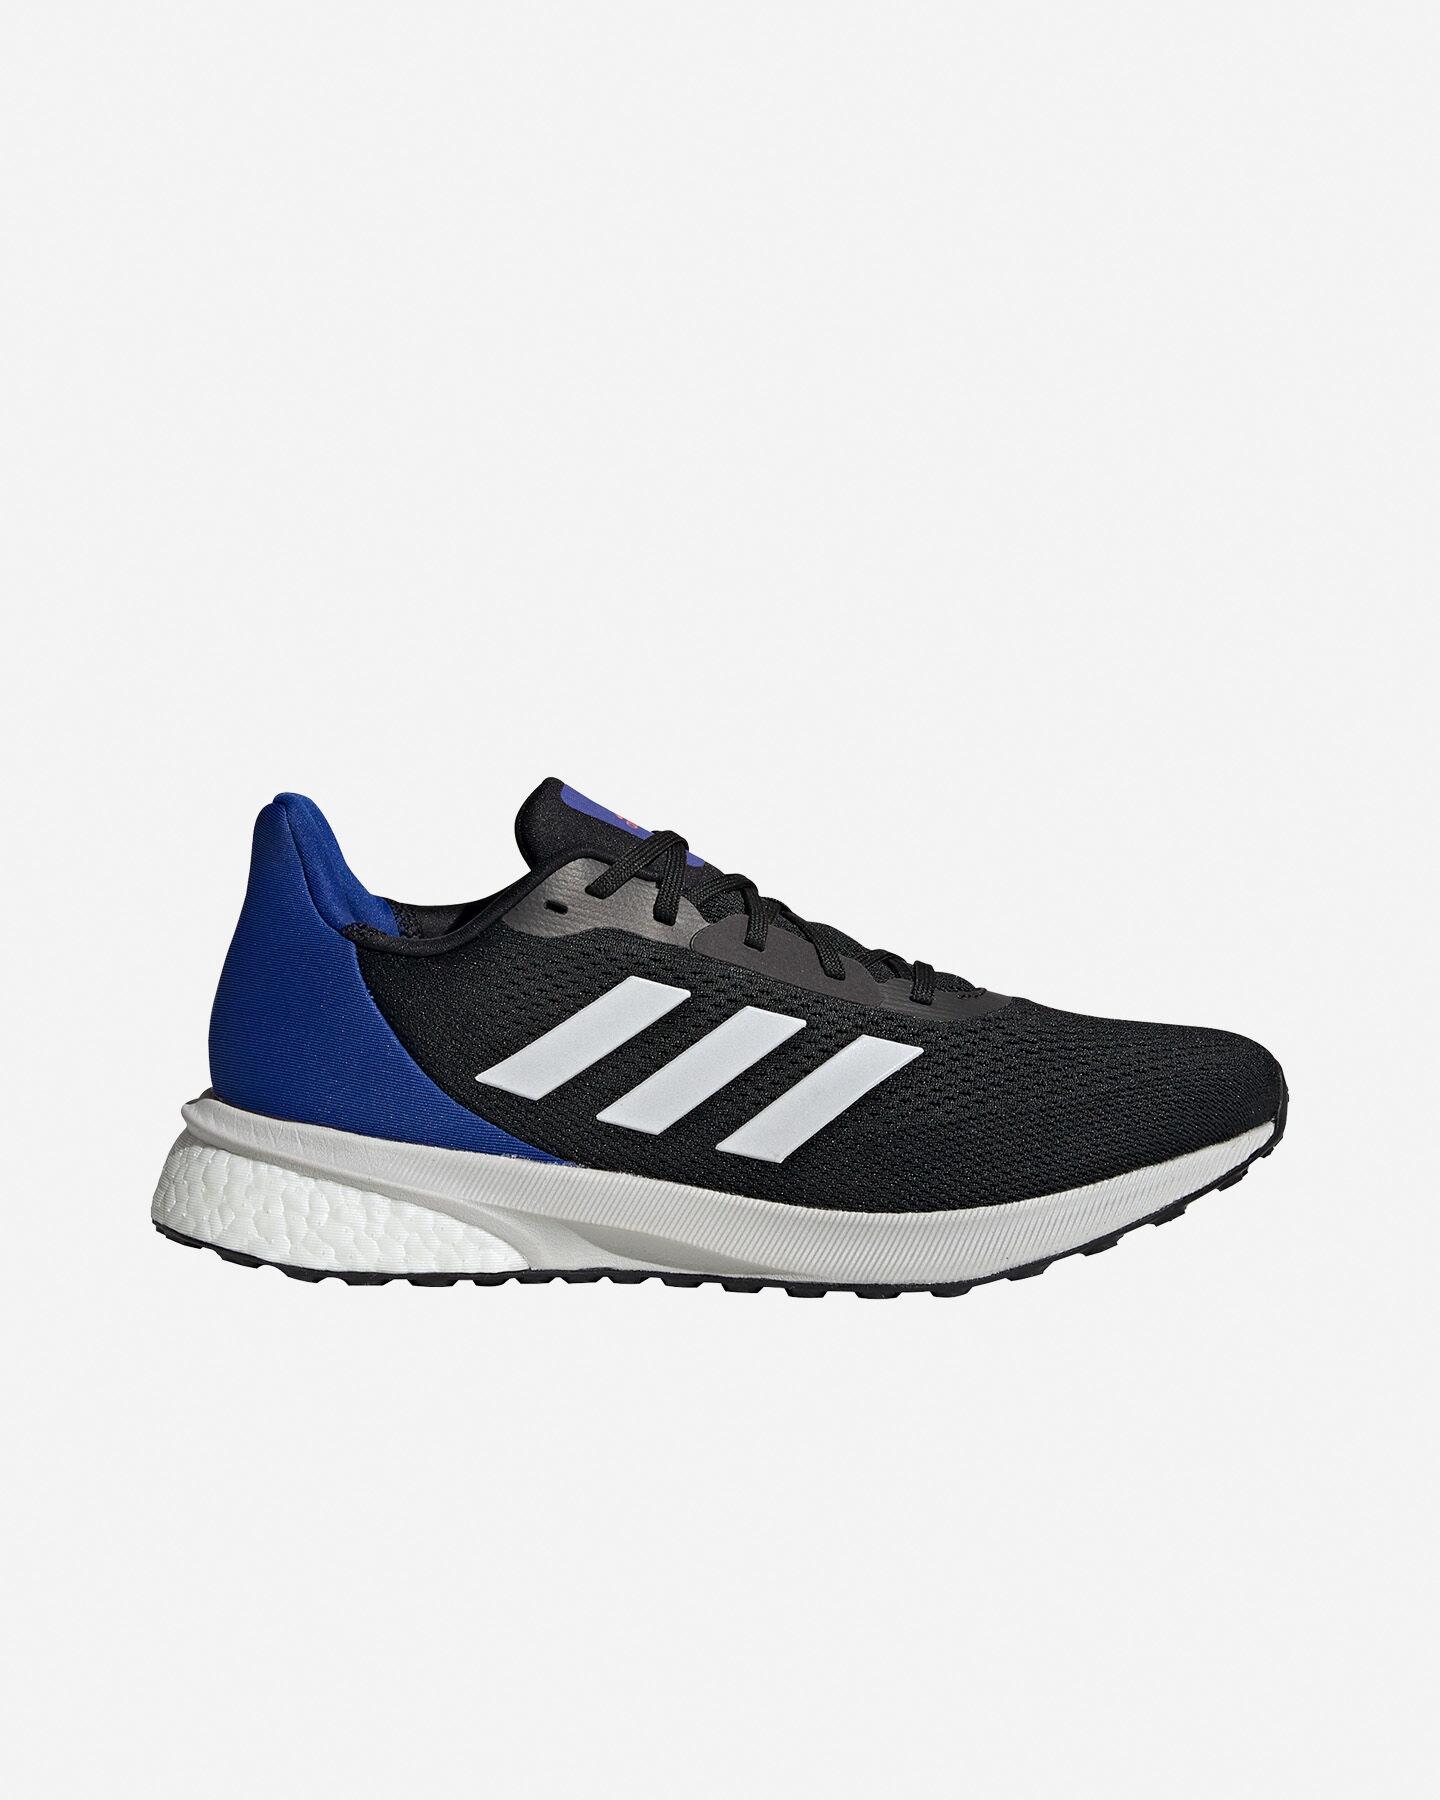 adidas astrarun m scarpe running uomo